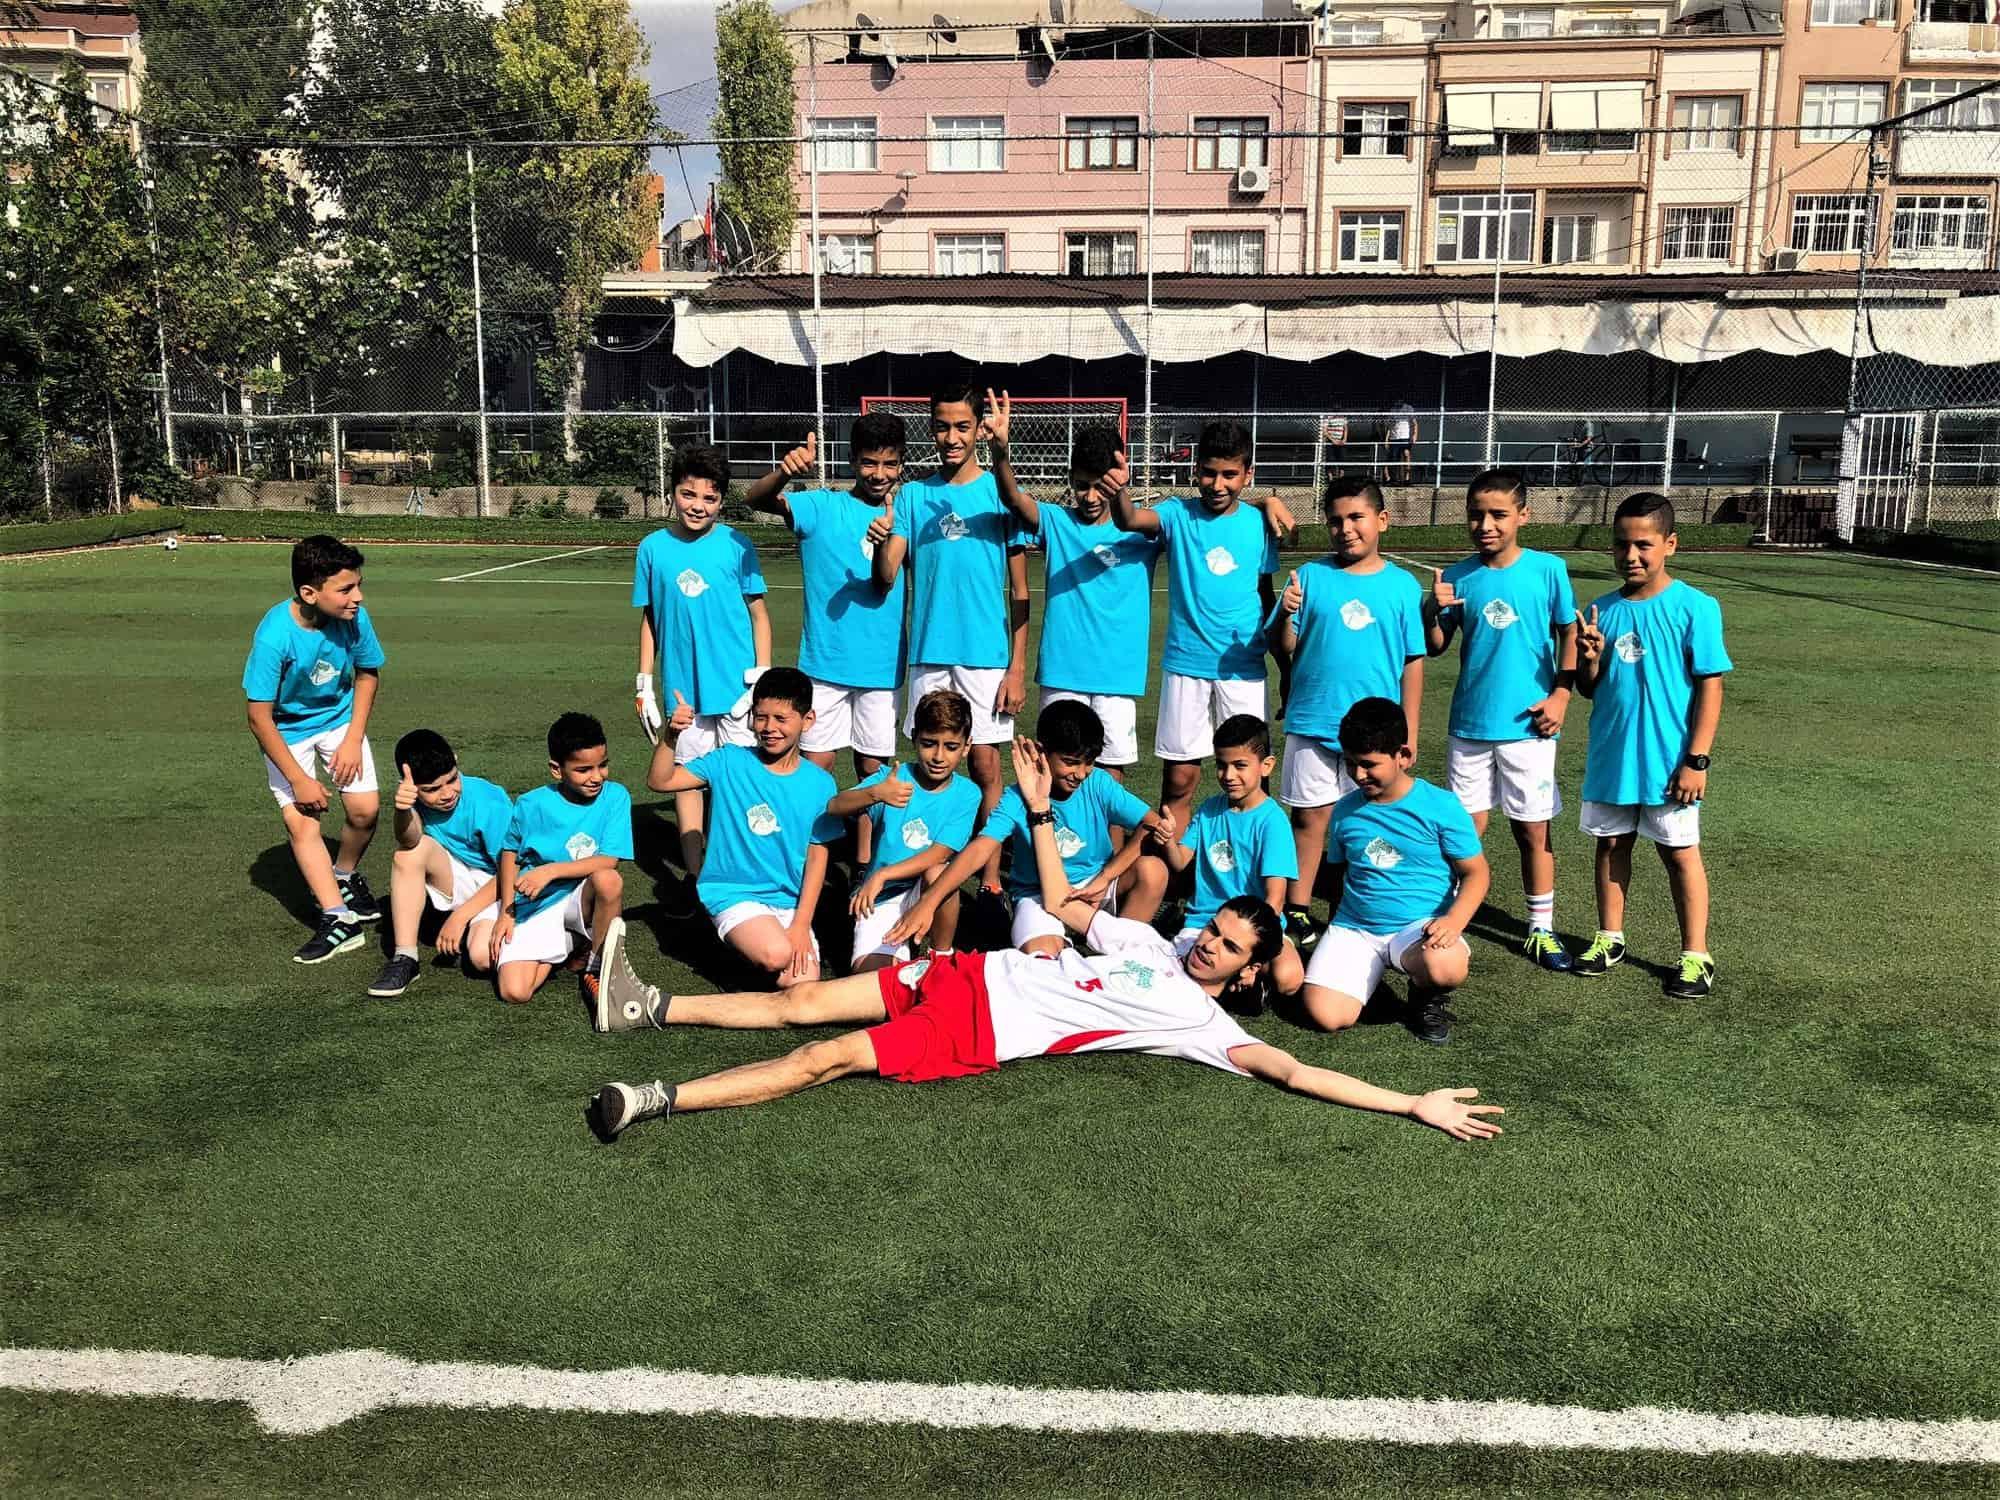 istanbul-syrian-refugee-football-team-spi (3)